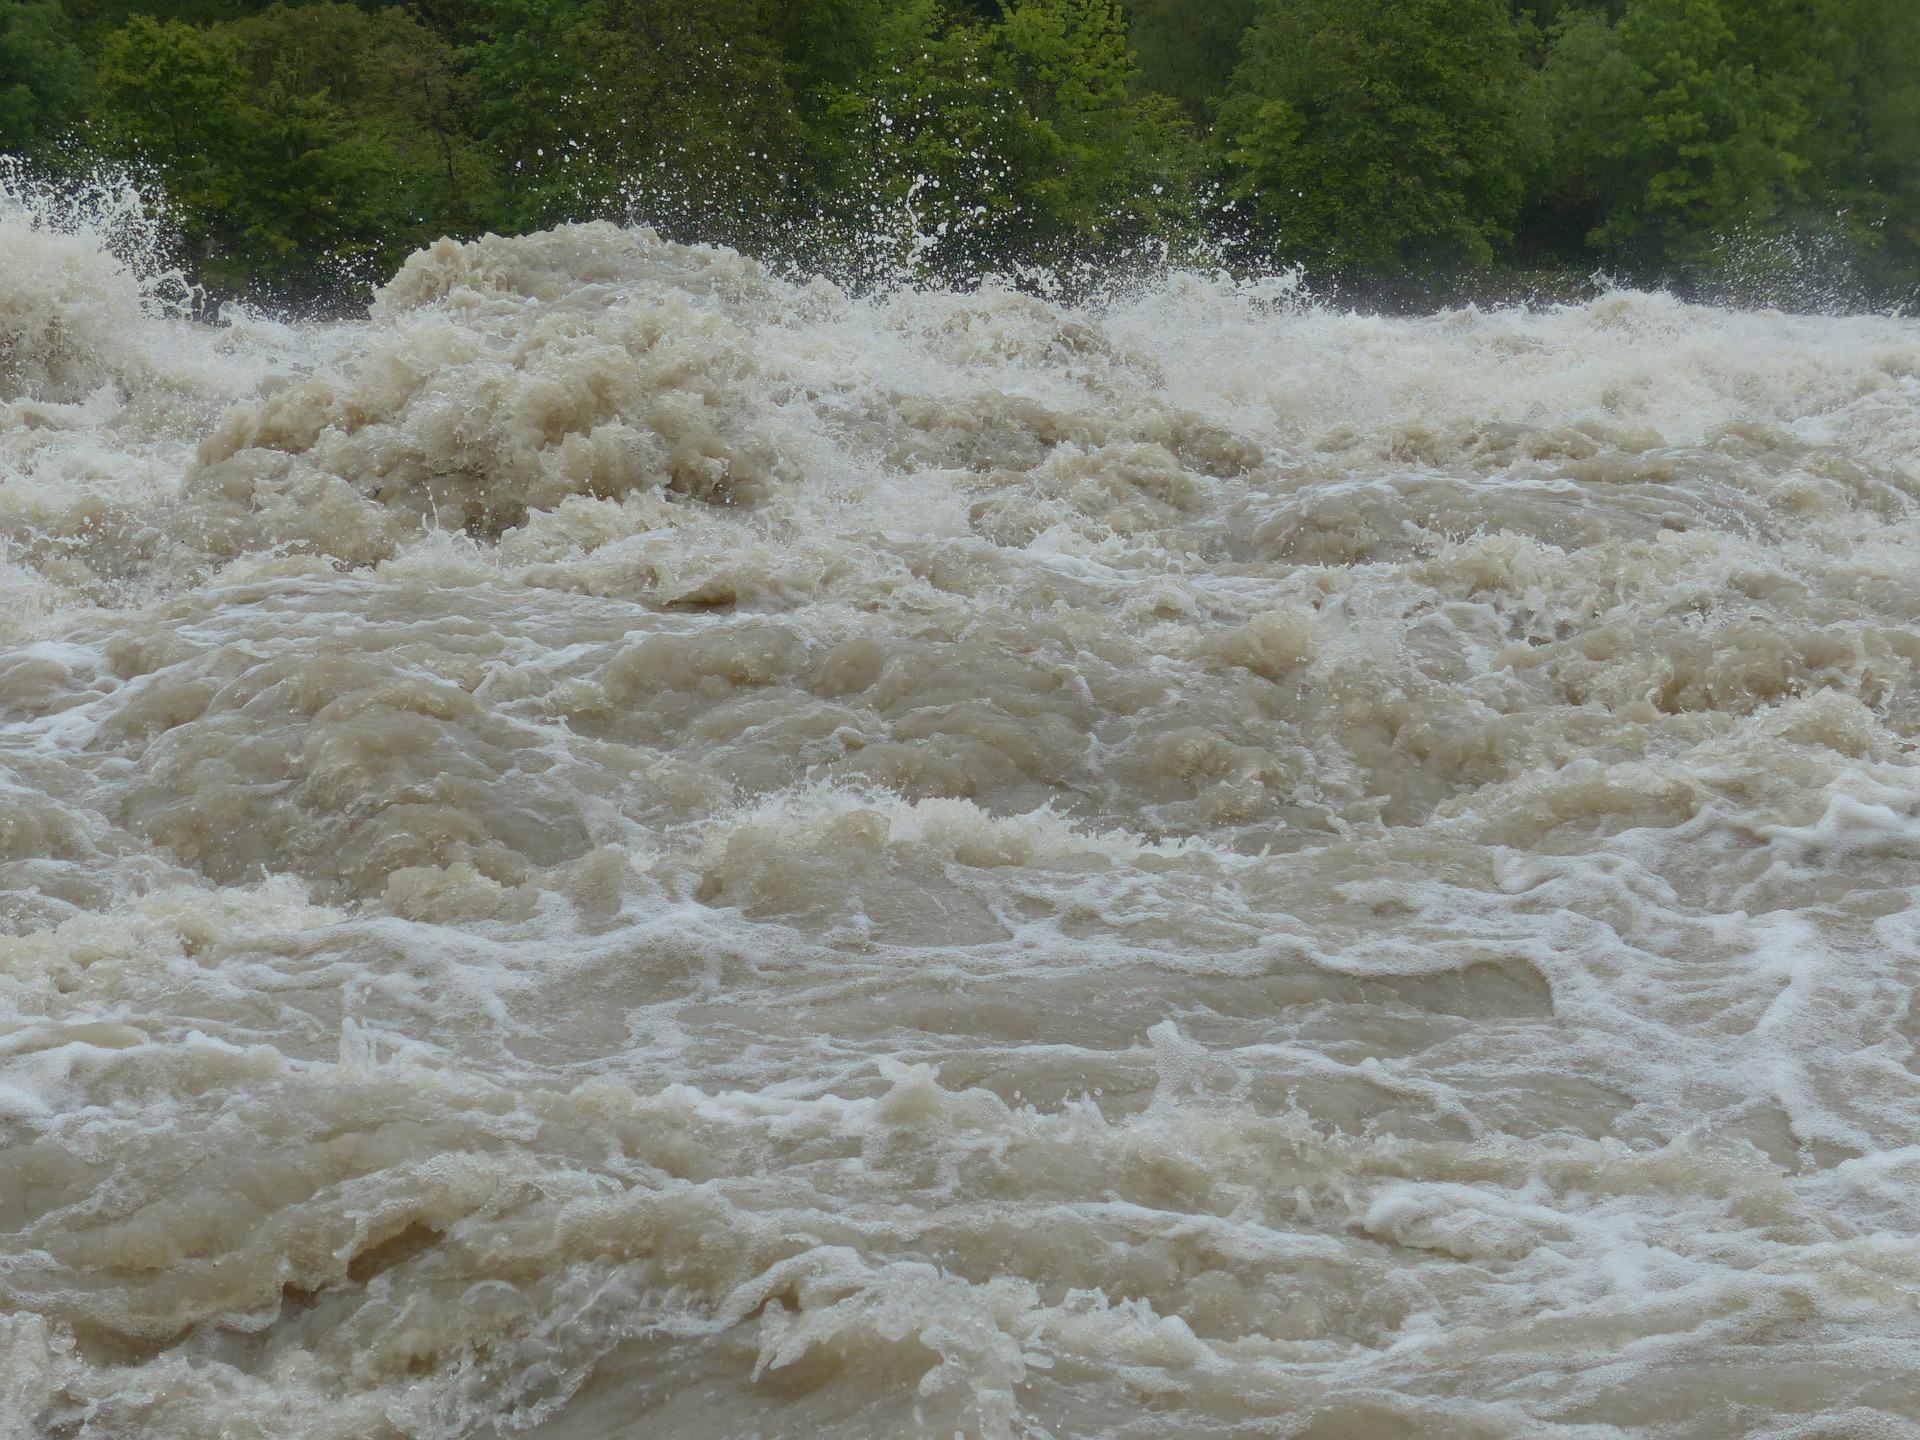 flooding in colorado springs